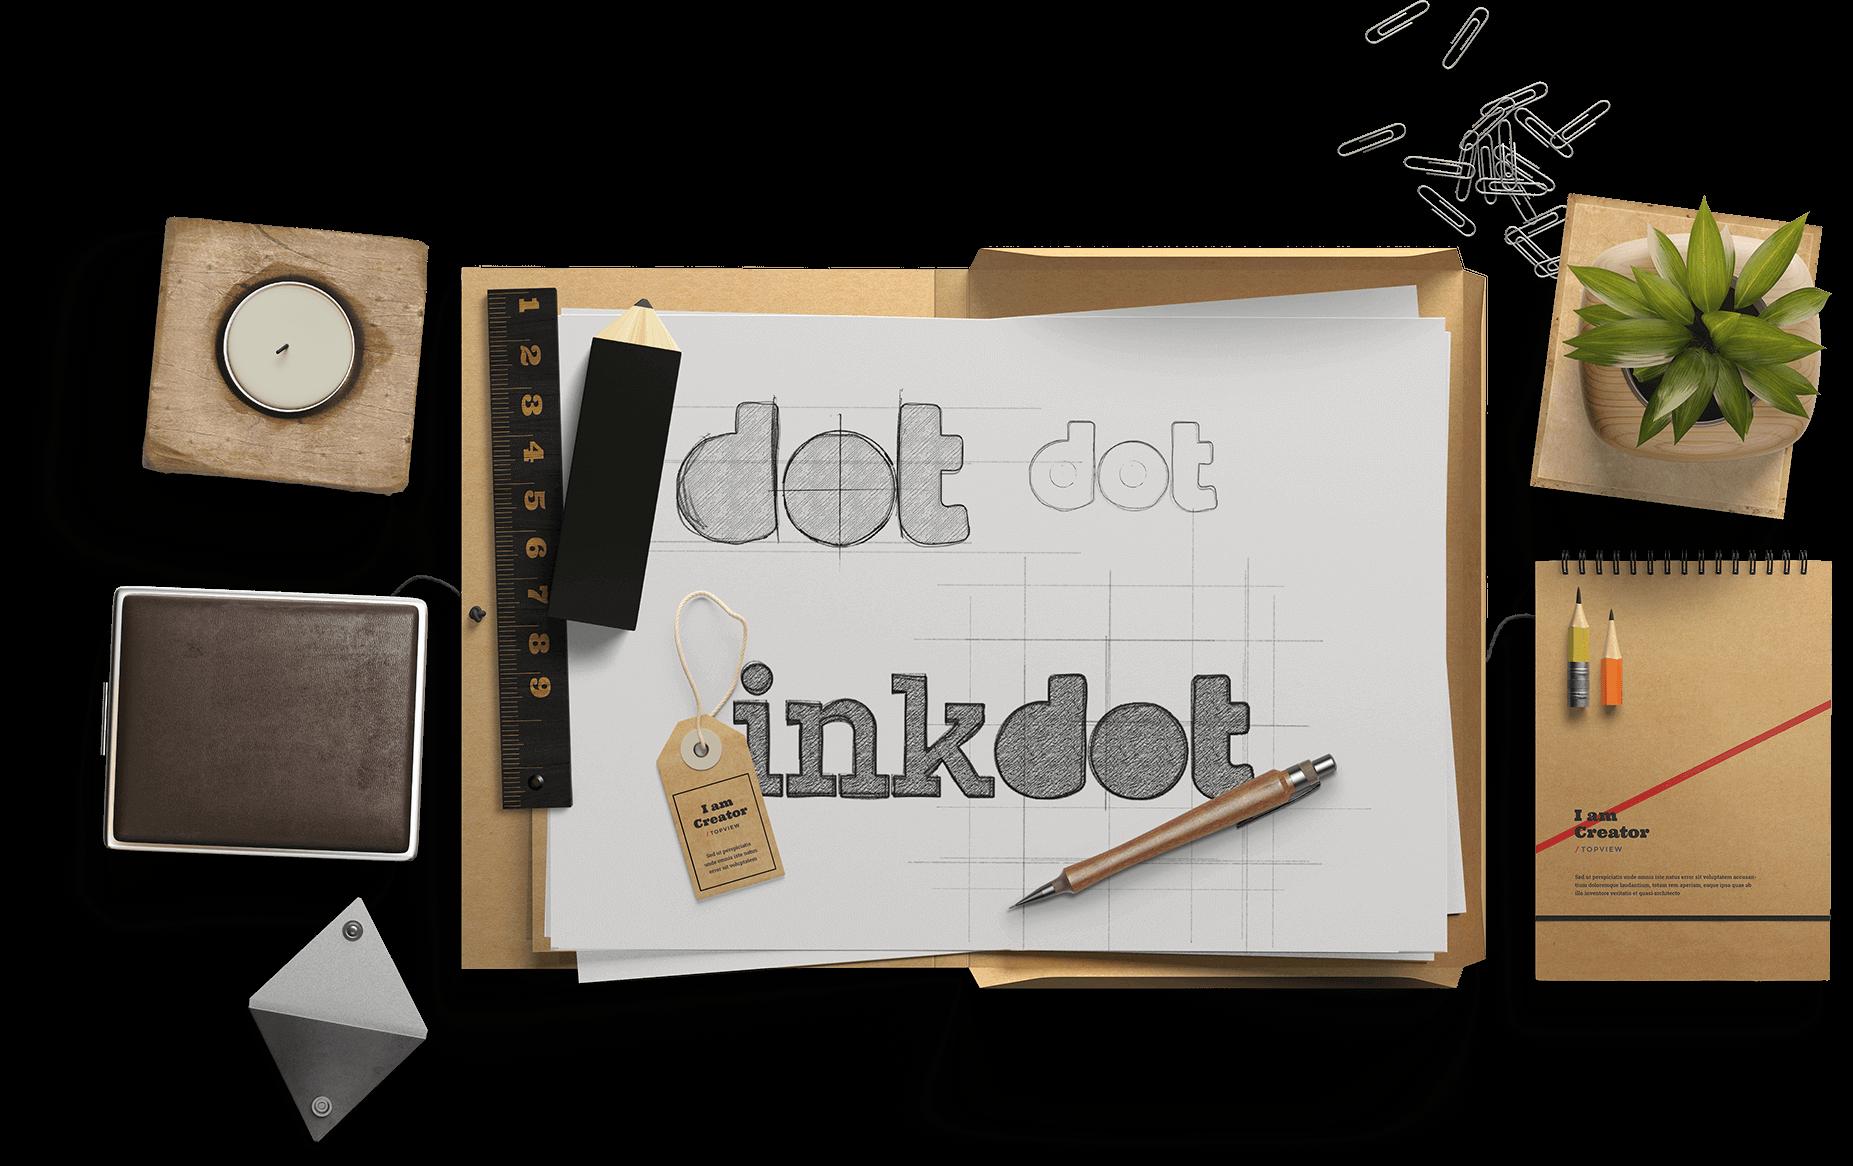 Inkdot app icon design